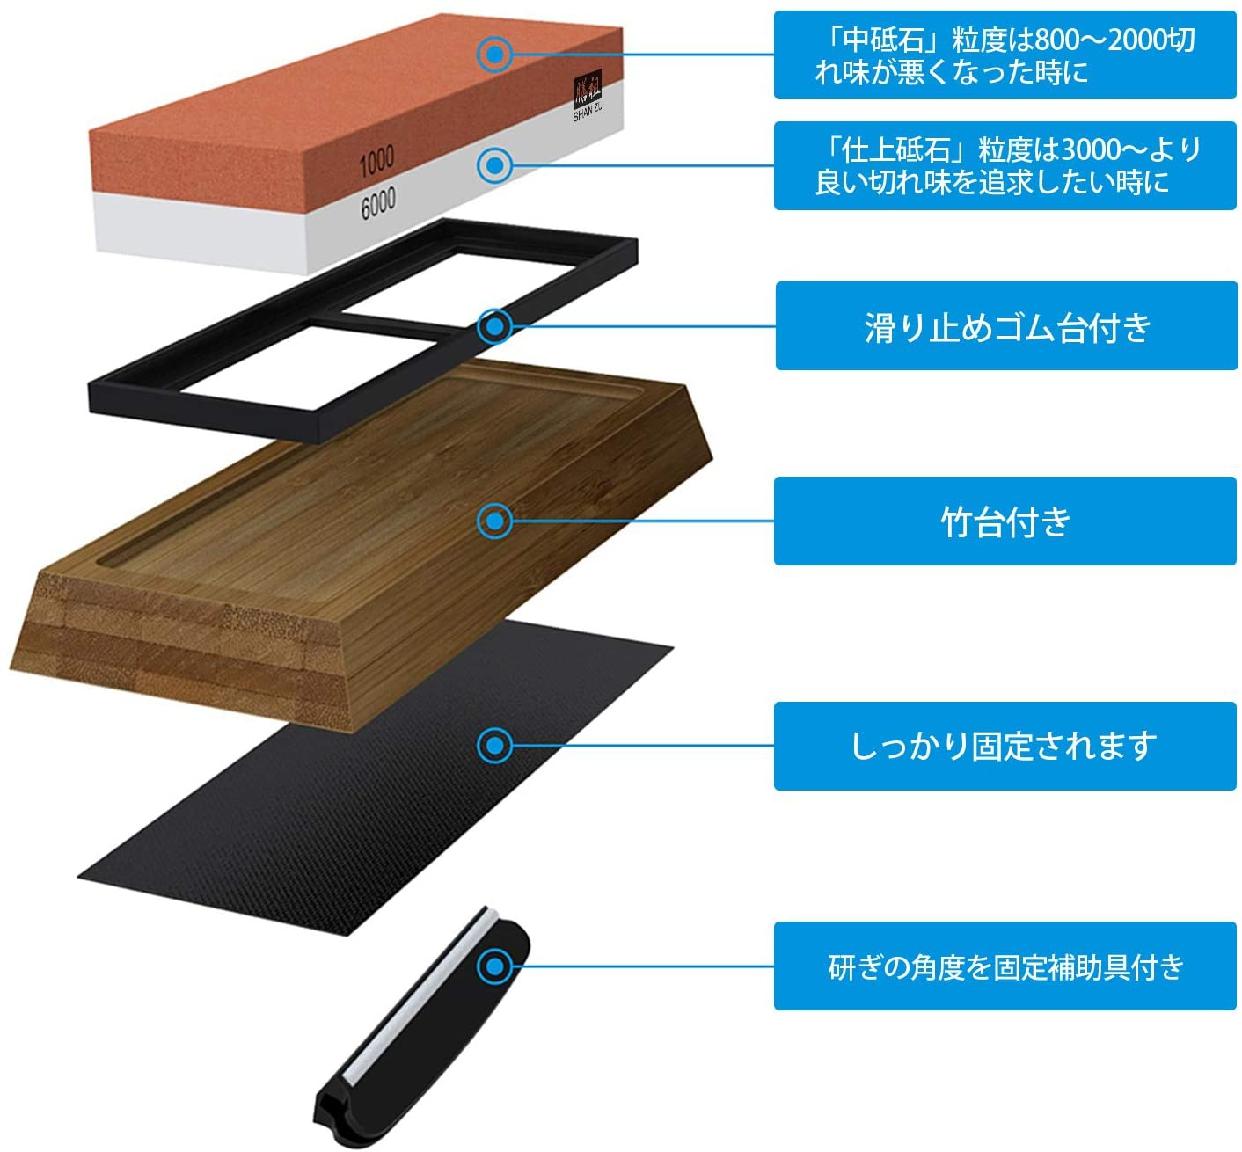 SHAN ZU 両面砥石 #1000/#6000 21.5 x 9.5 x 5.5 cmの商品画像2